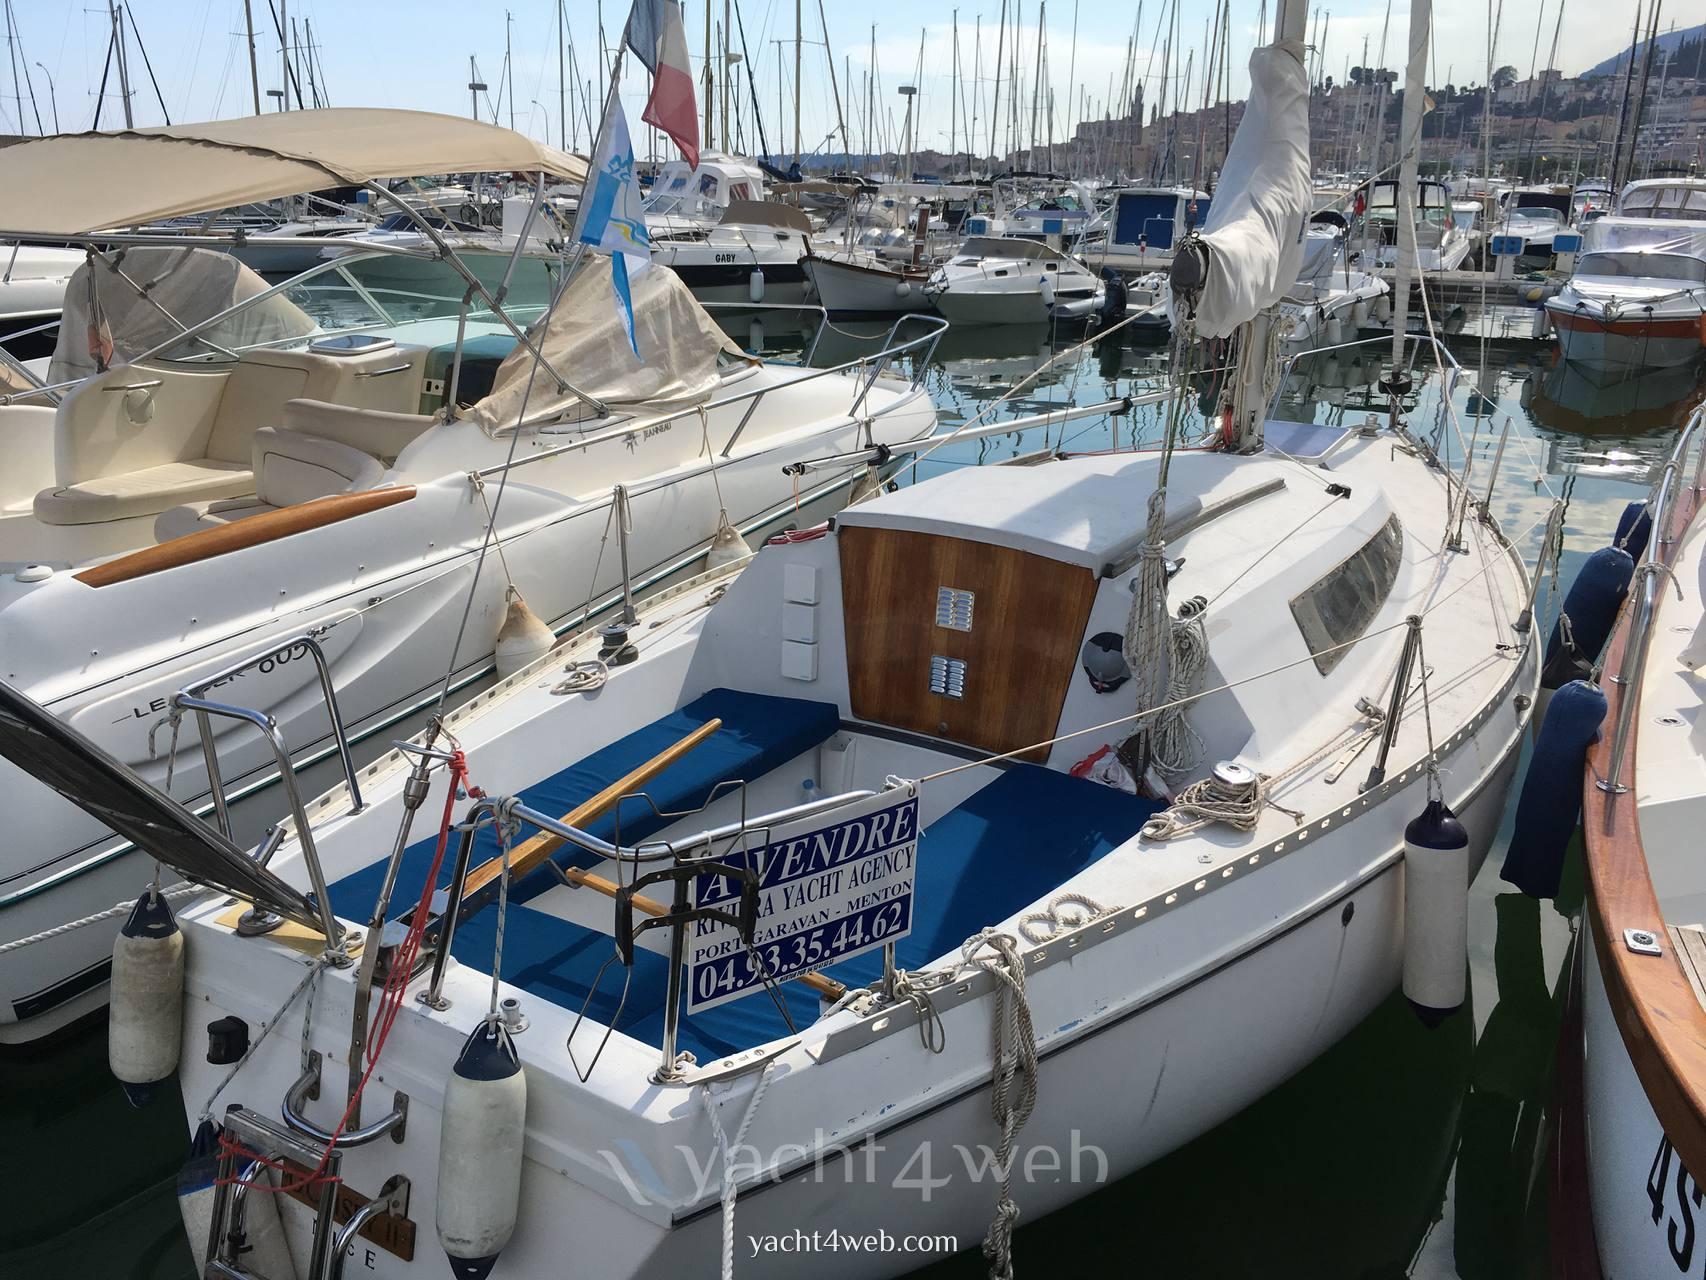 GILBERT MARINE Gib sea 26 Sailing boat used for sale